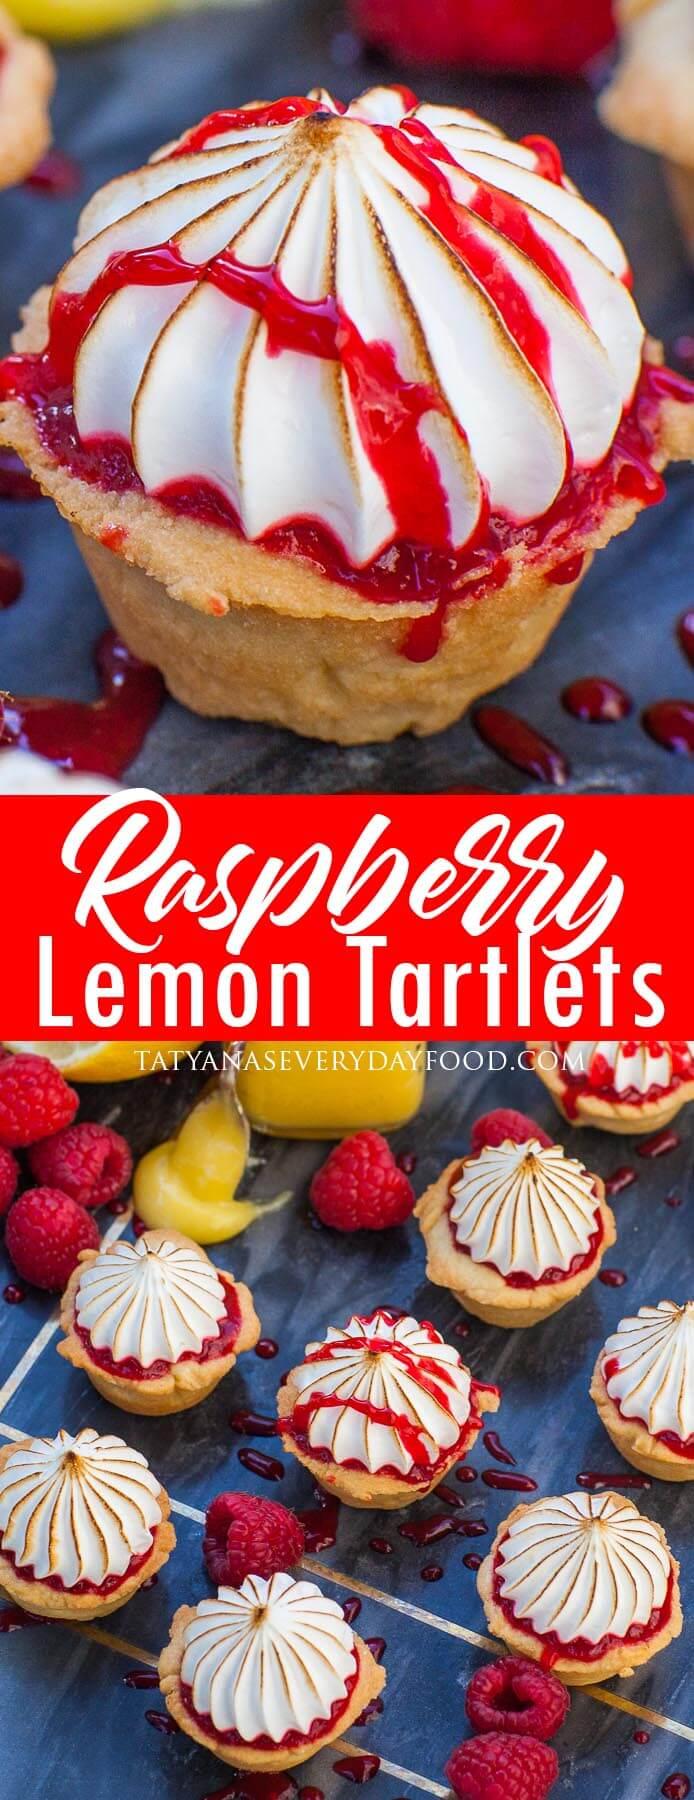 Raspberry Lemon Tartlets video recipe